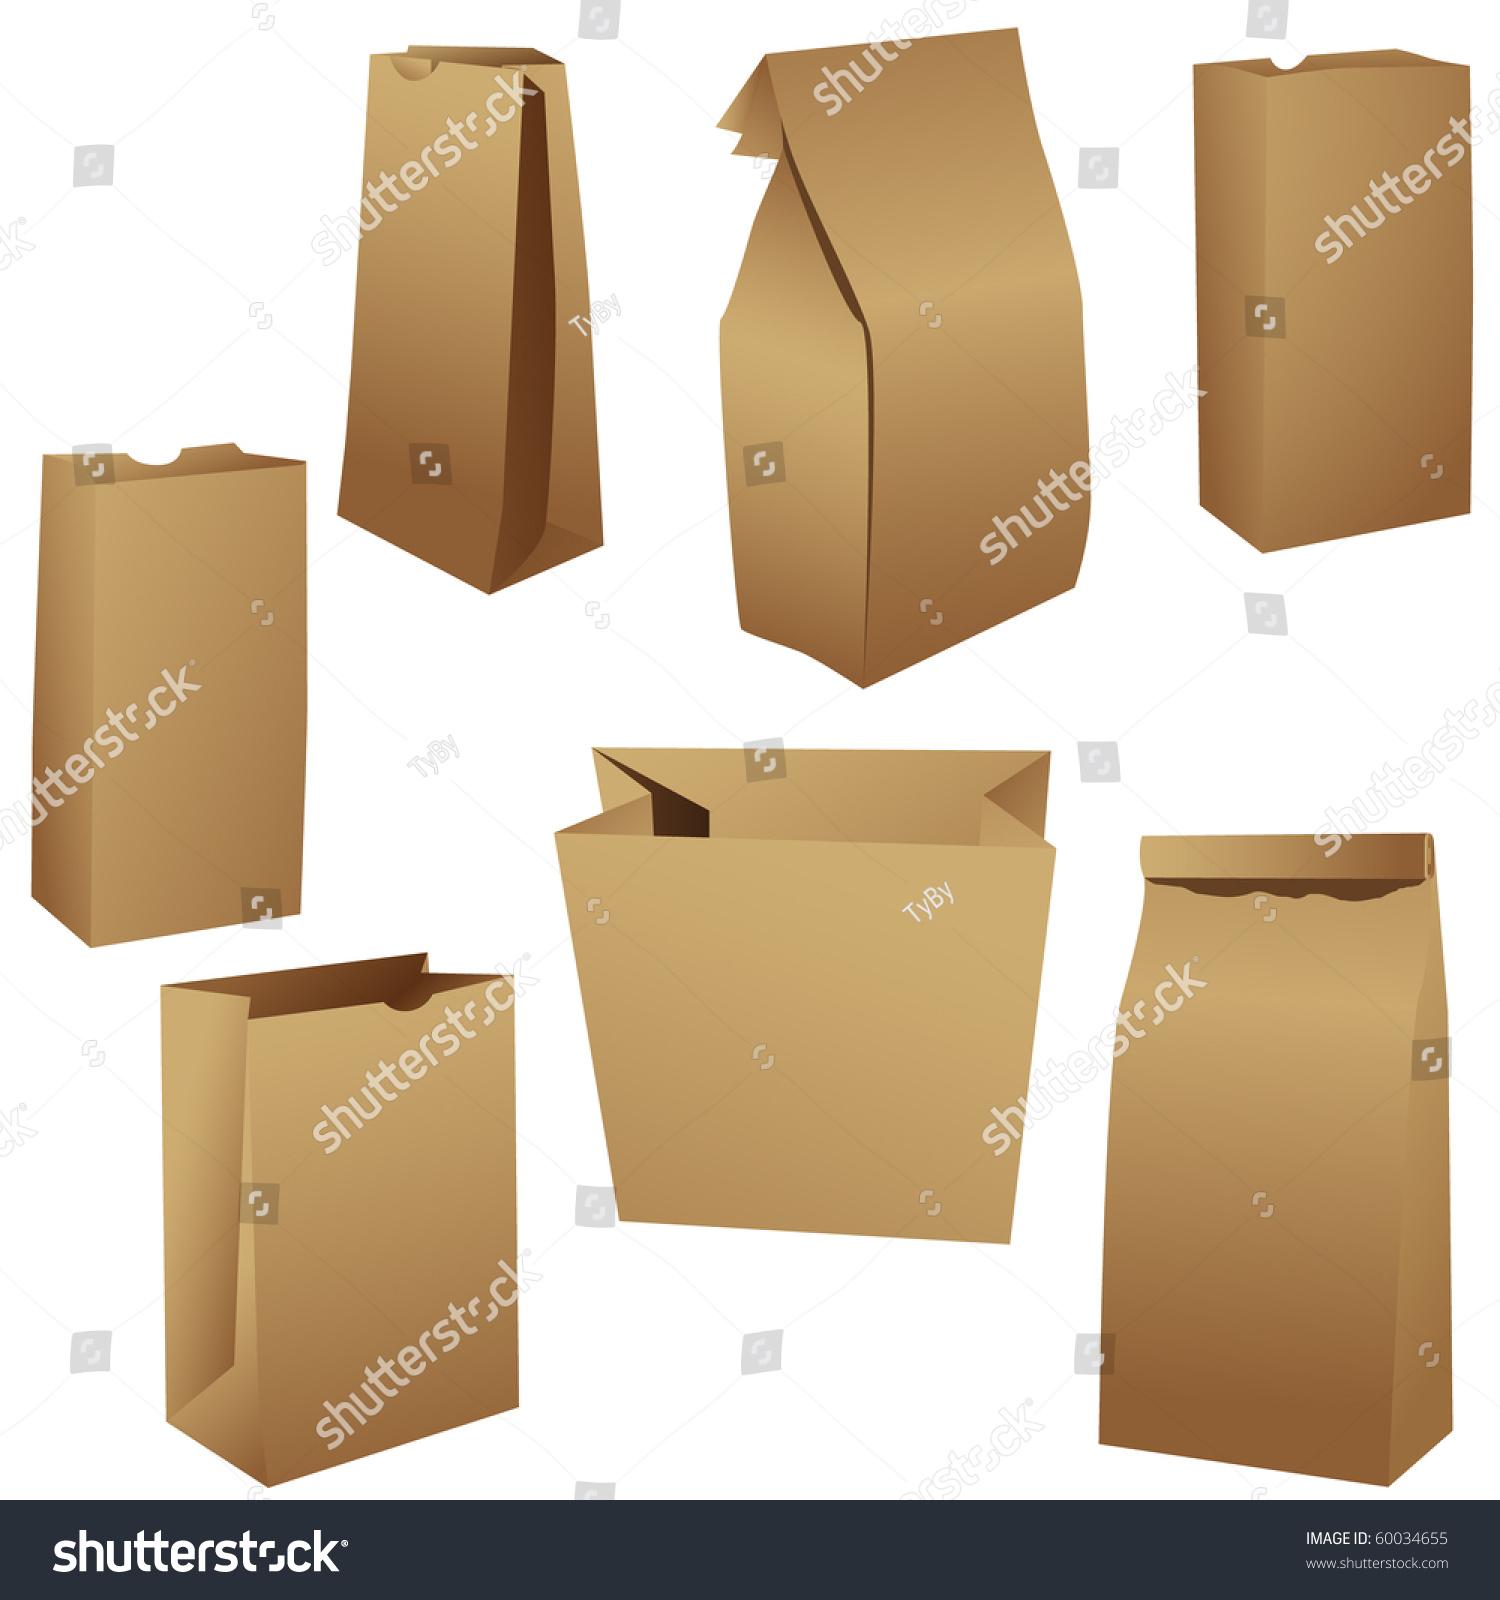 Paper bag vector - Brown Paper Lunch Bags Set Vector